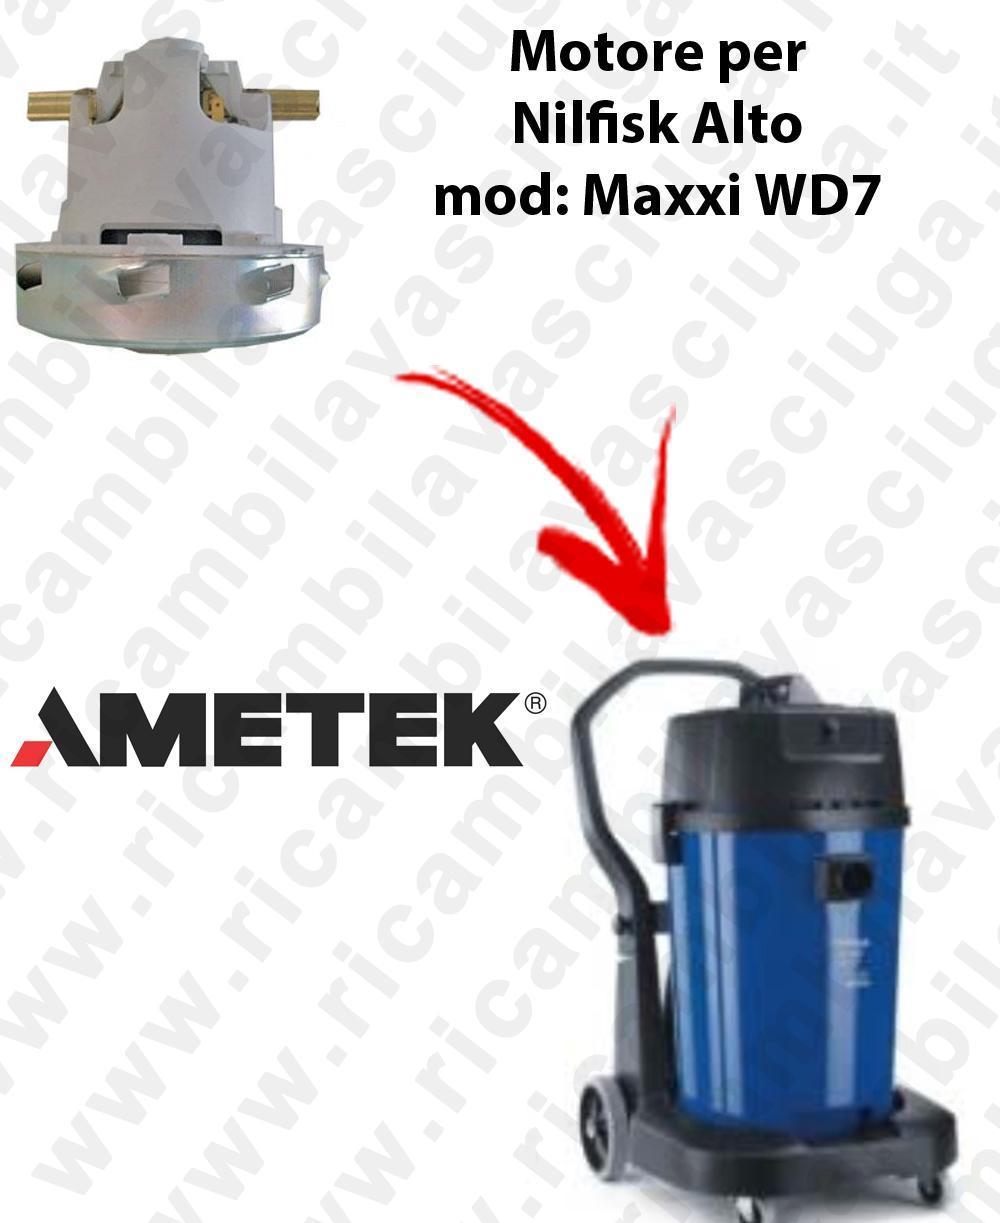 MAXXI WD7 Saugmotor AMETEK für Staubsauger NILFISK ALTO